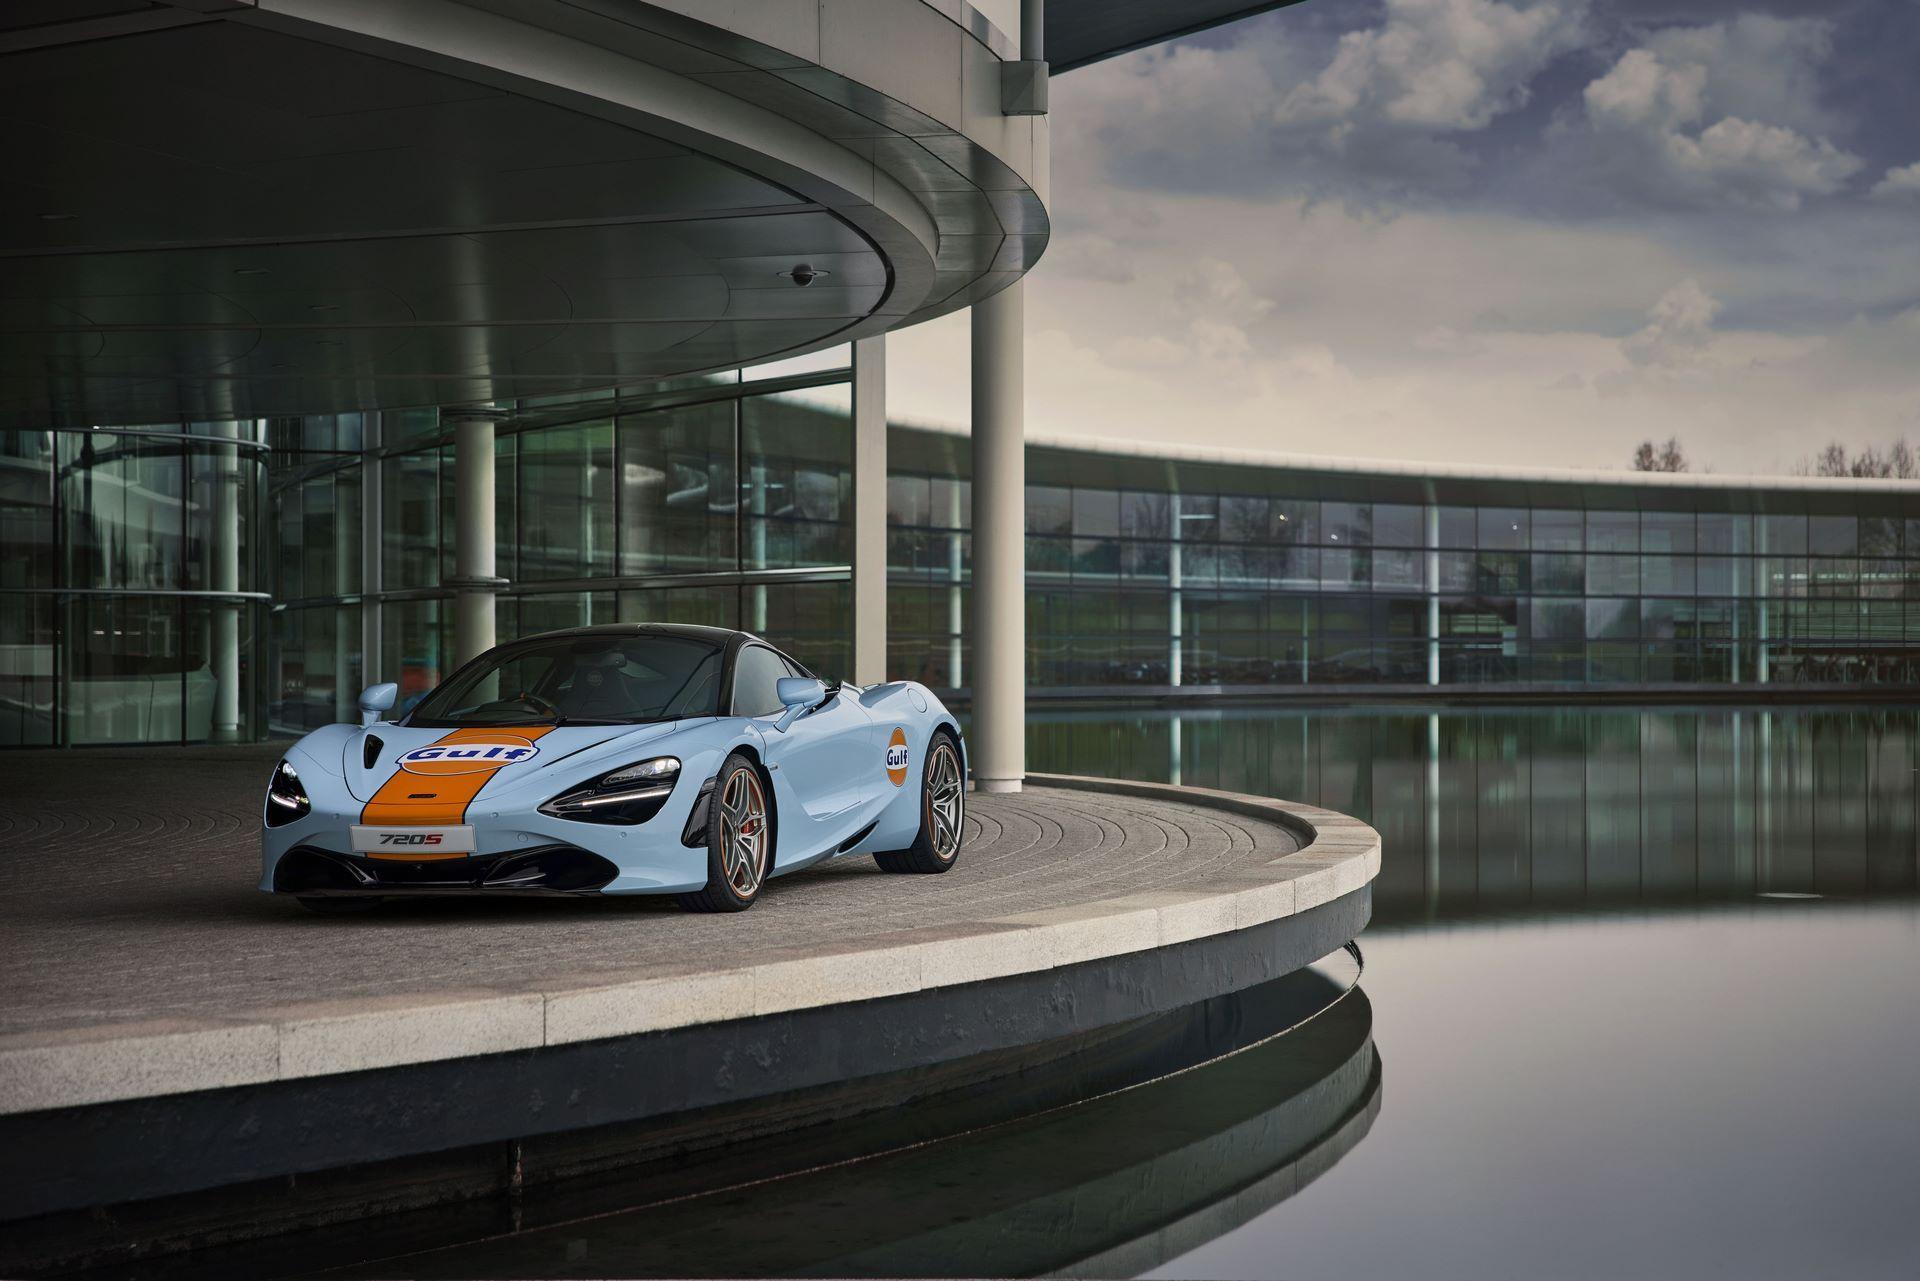 McLaren-720S-with-Gulf-livery-1